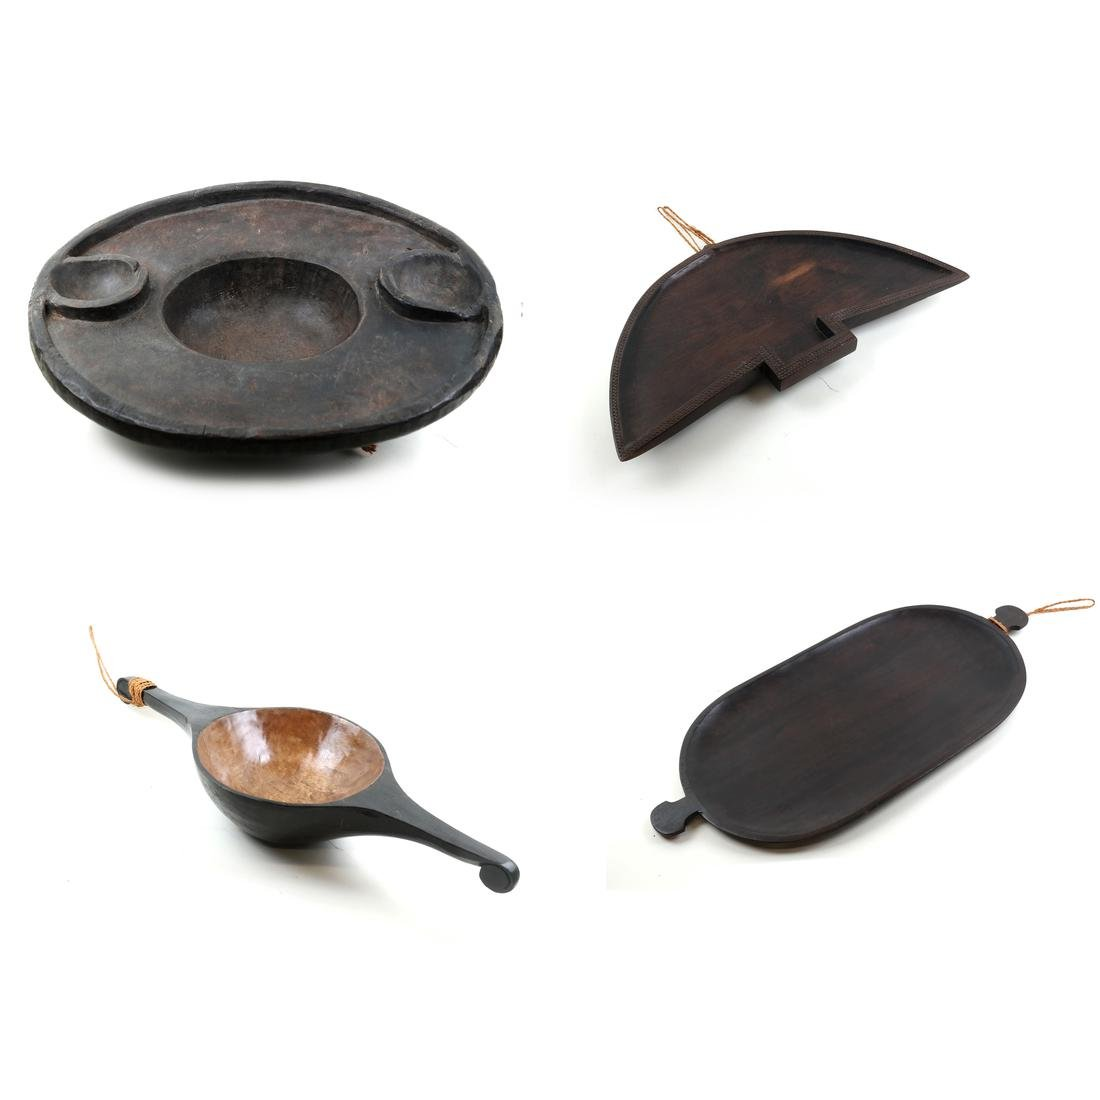 Ceremonial Oceanic Carved Wood Vessels